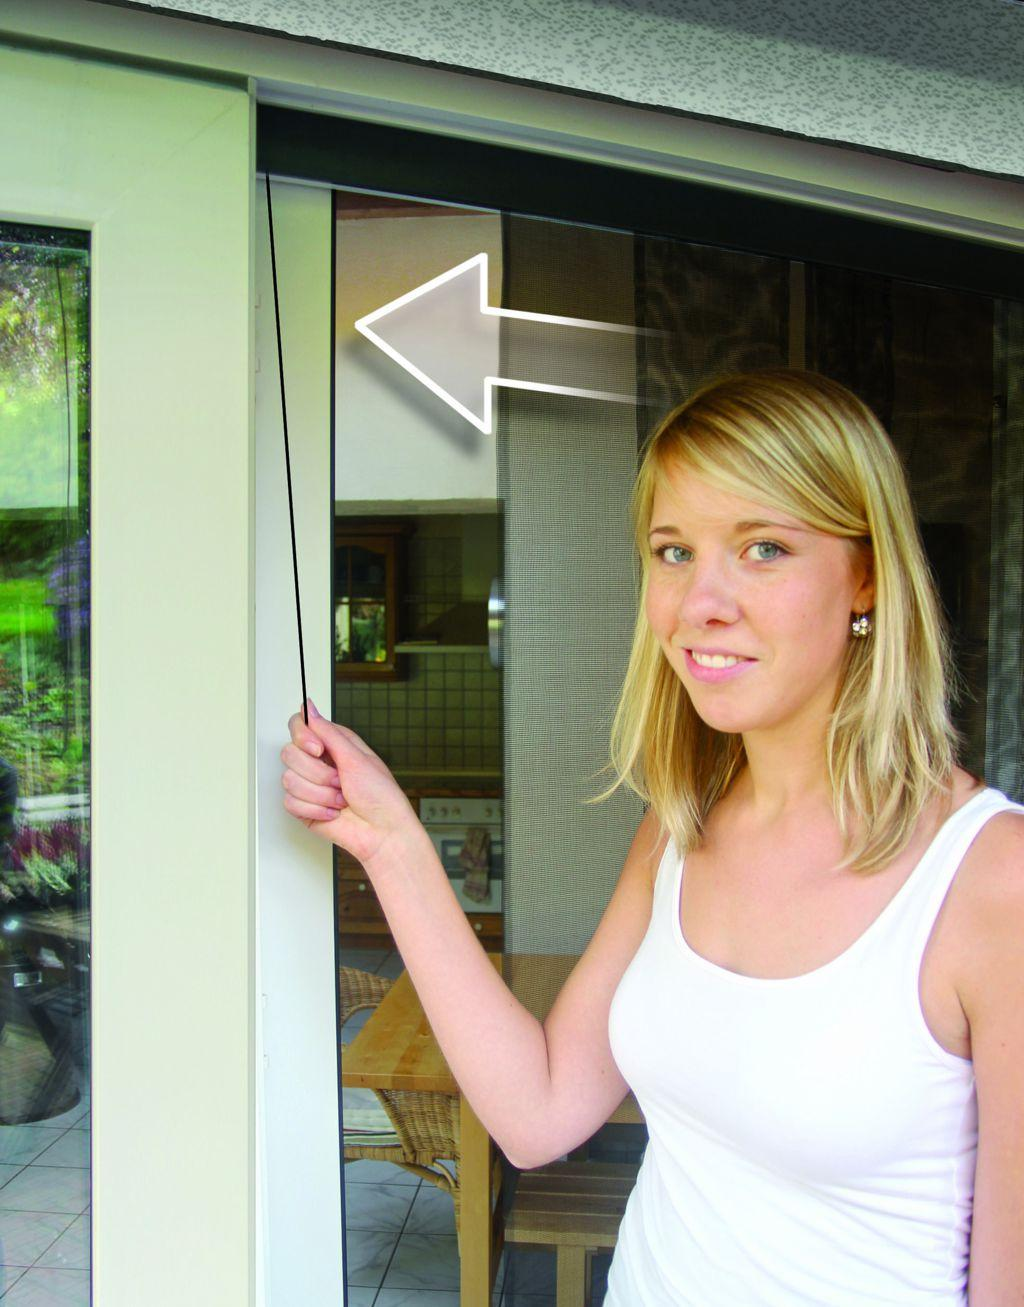 schellenberg 50662 is vorhang premium 95 x 220 cm anthrazit baumarkt. Black Bedroom Furniture Sets. Home Design Ideas